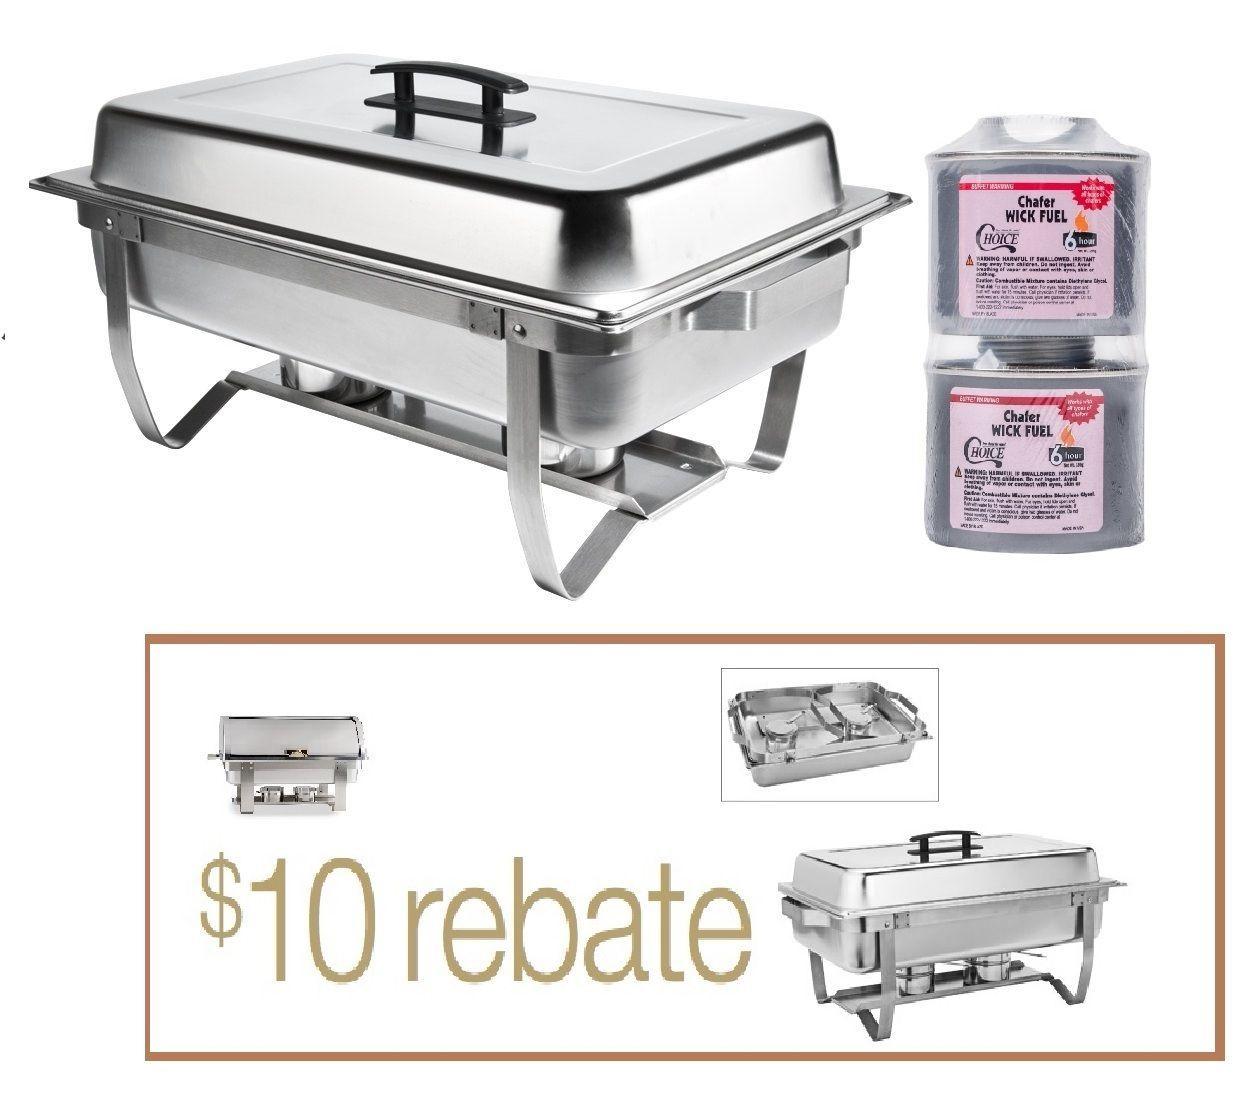 4QT CLASSIC Rectangular Chafing Dish Chafer Catering Buffet Warmer FREE SHIP +$$